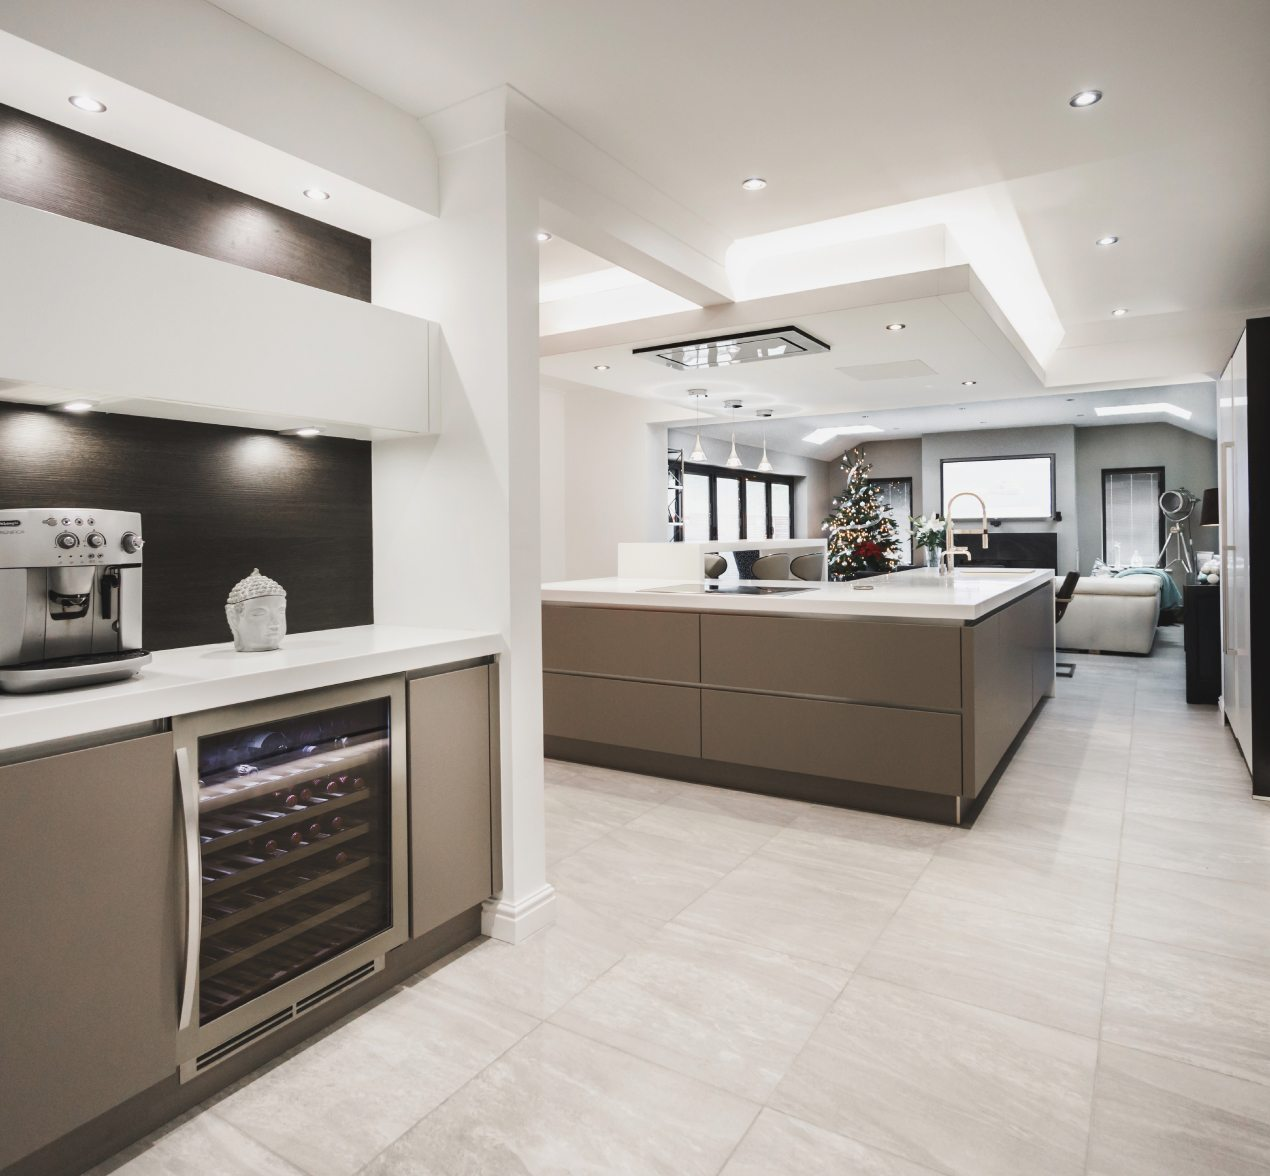 Designer Kitchen Case Study In Colne  Kitchen Design Centre